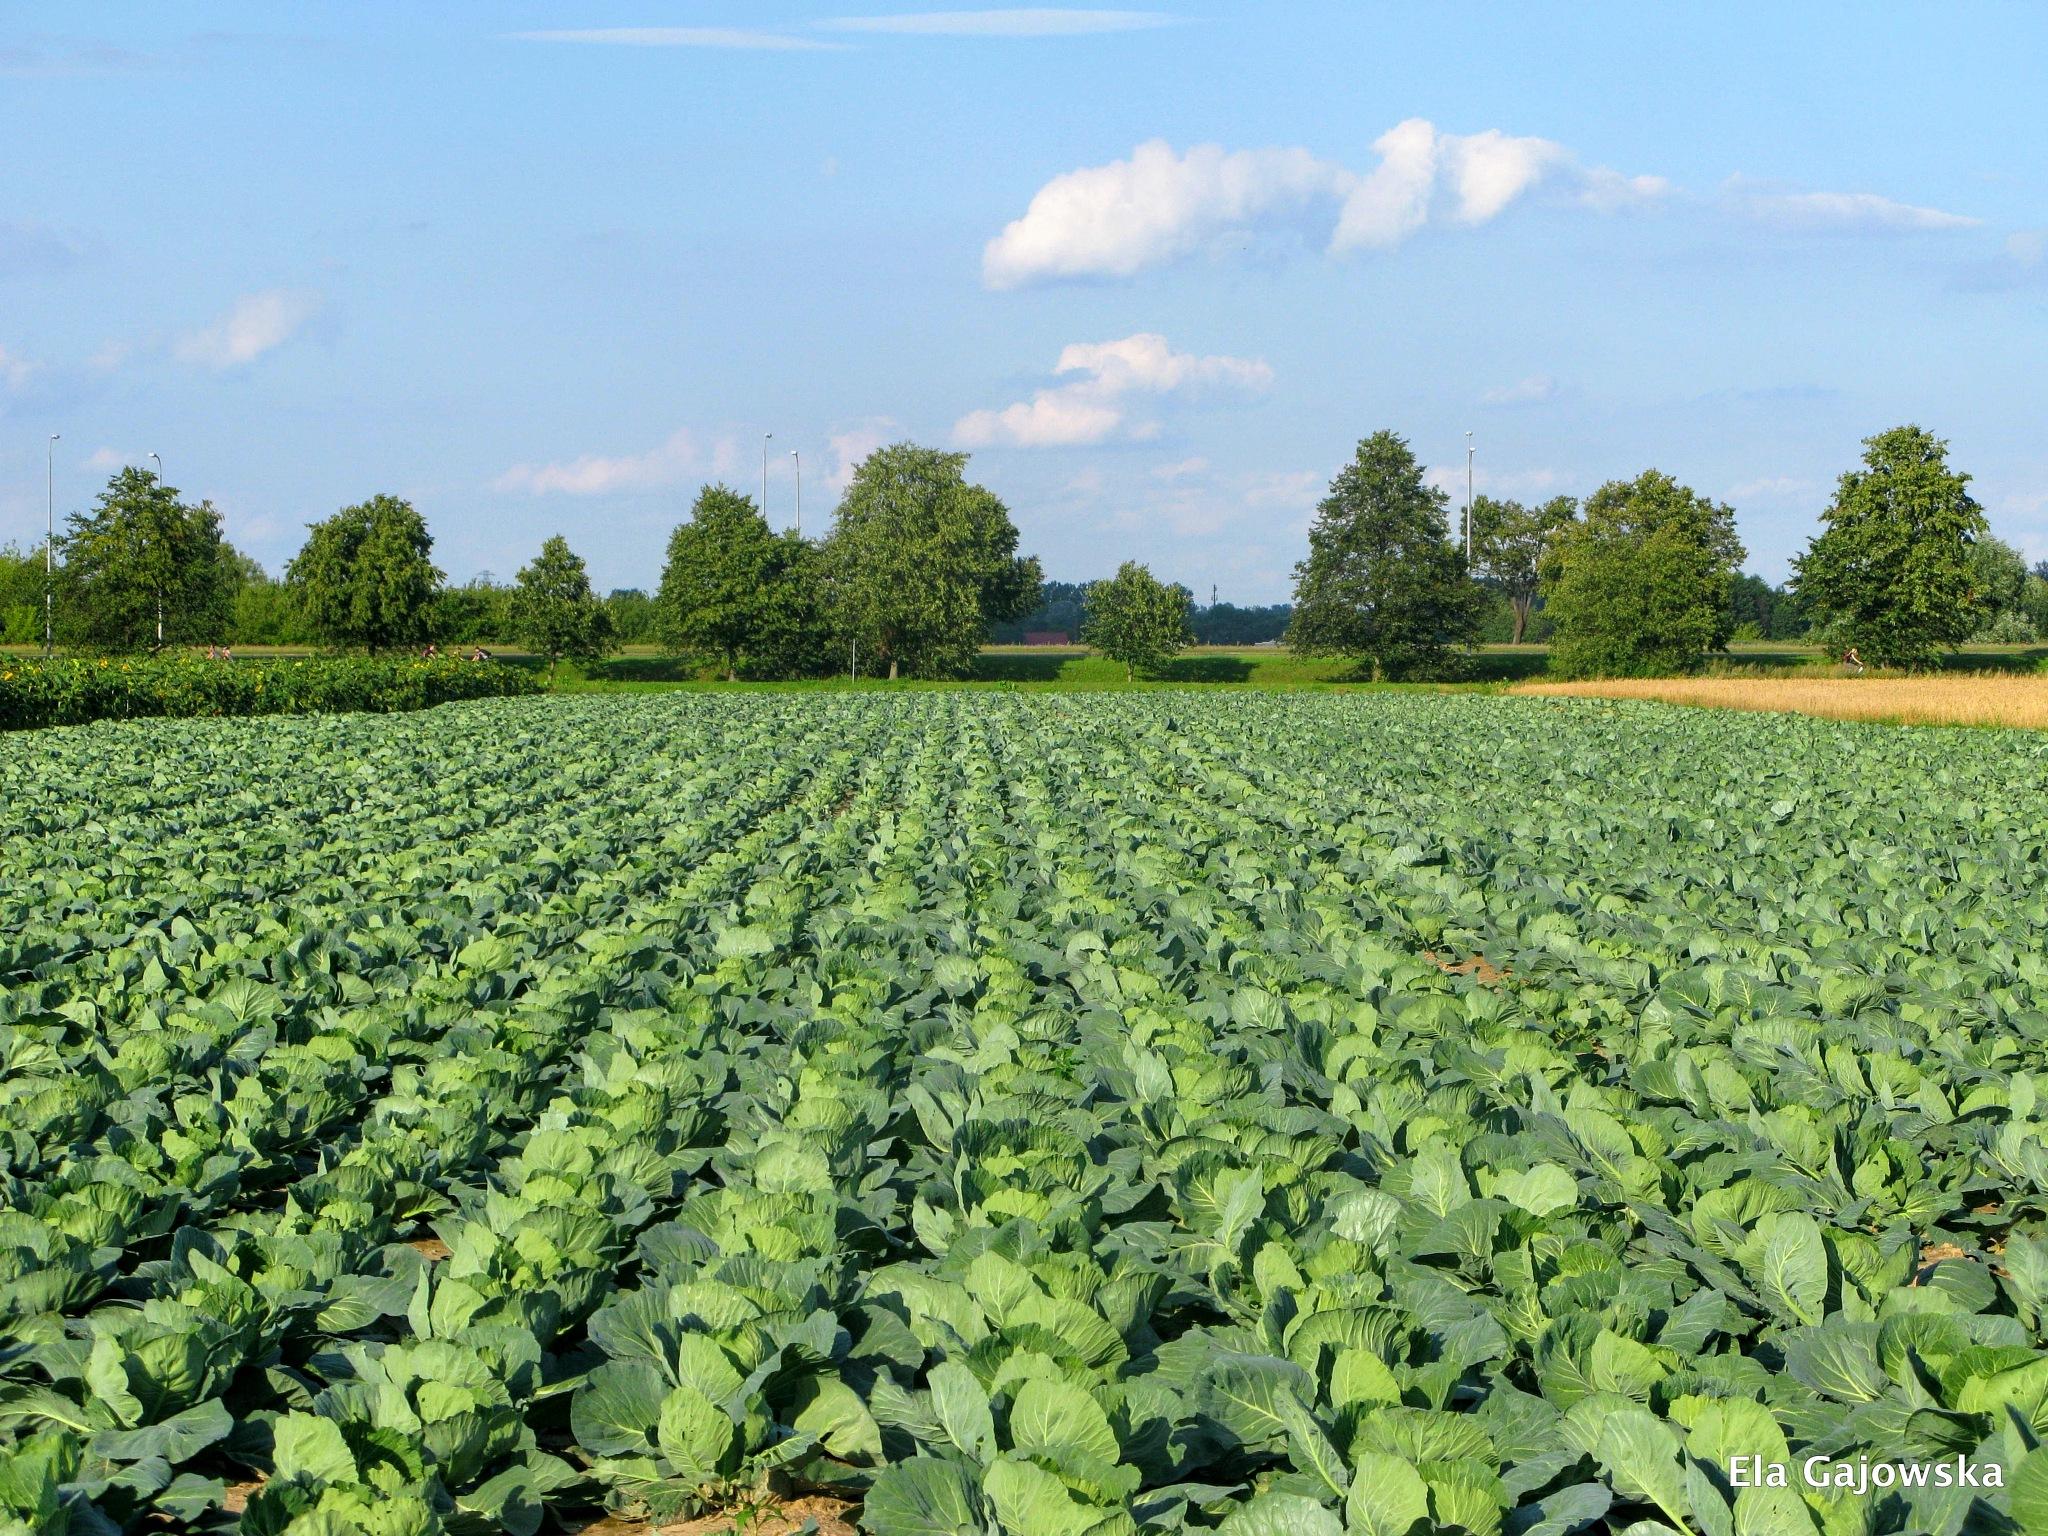 Cabbage field by Ela Gajowska